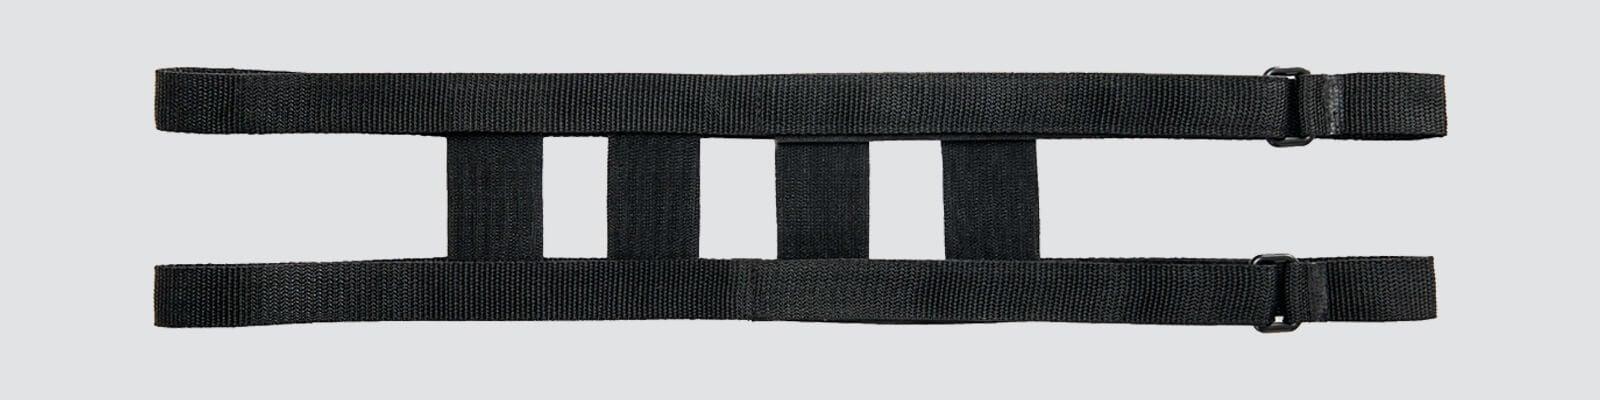 BodyMap Fixiergurt für Kopfstütze